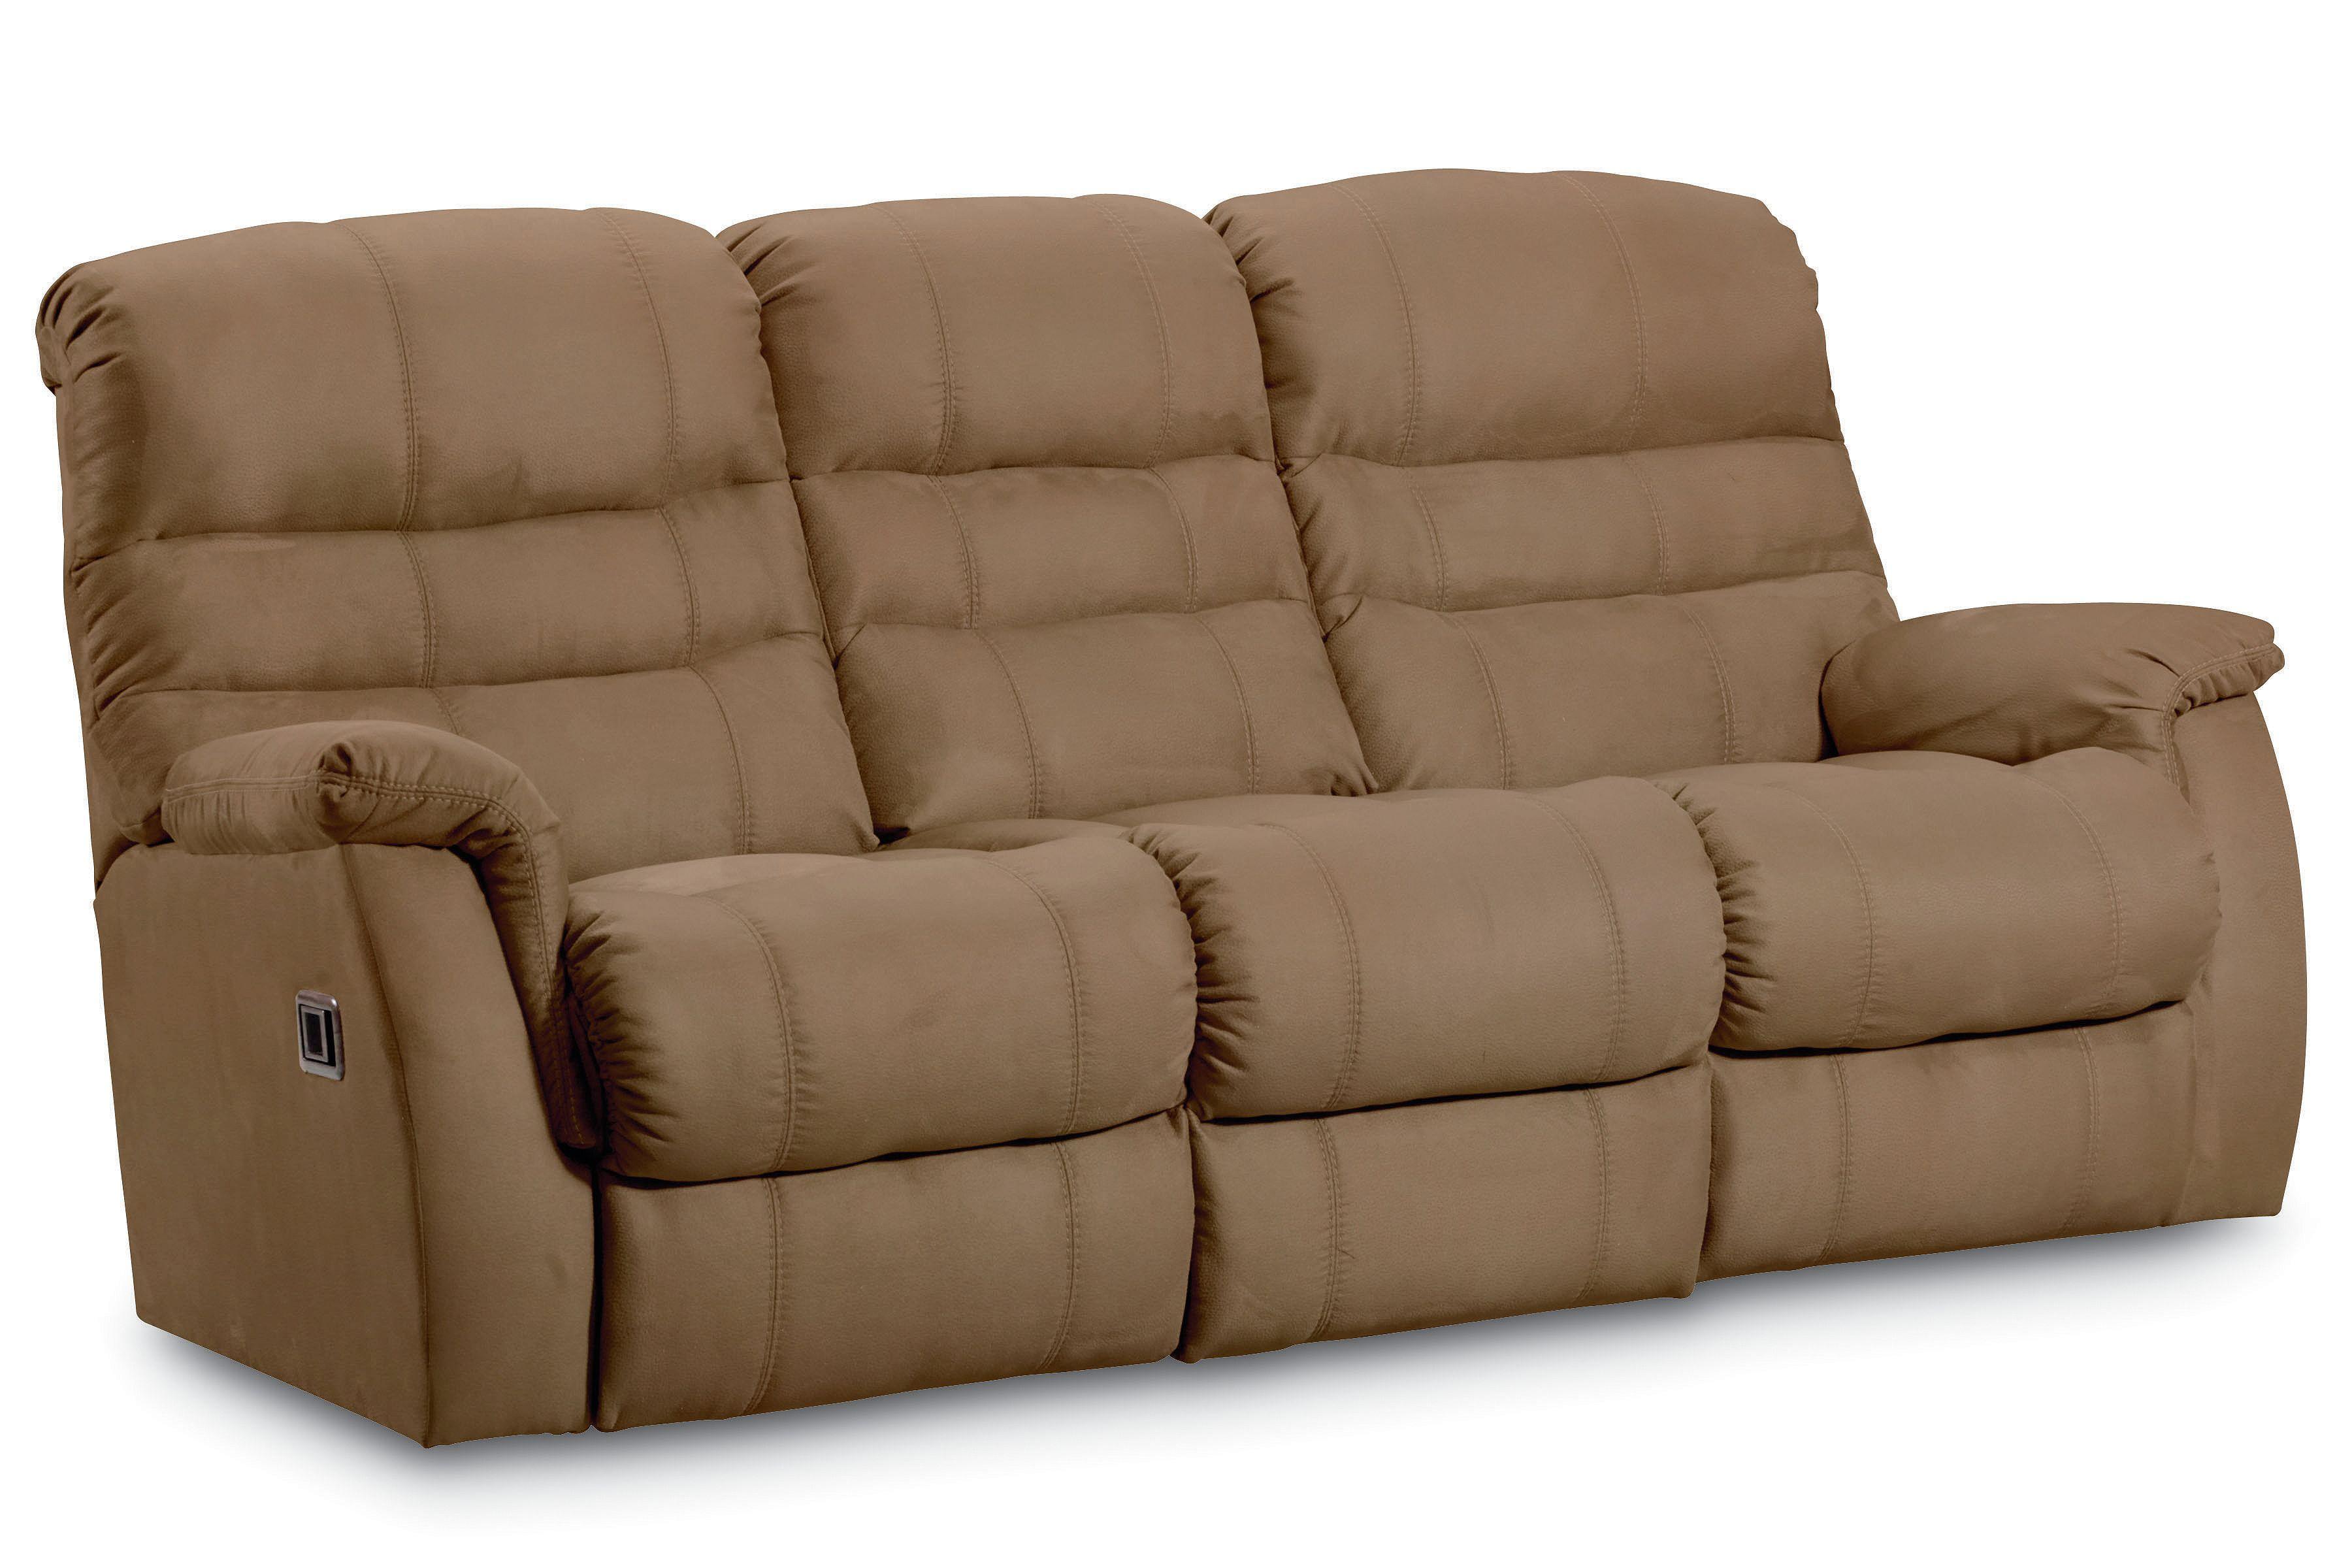 Lane Garrett 328 39 Casual Garrett Double Reclining Sofa Miller Brothers Furniture Reclining